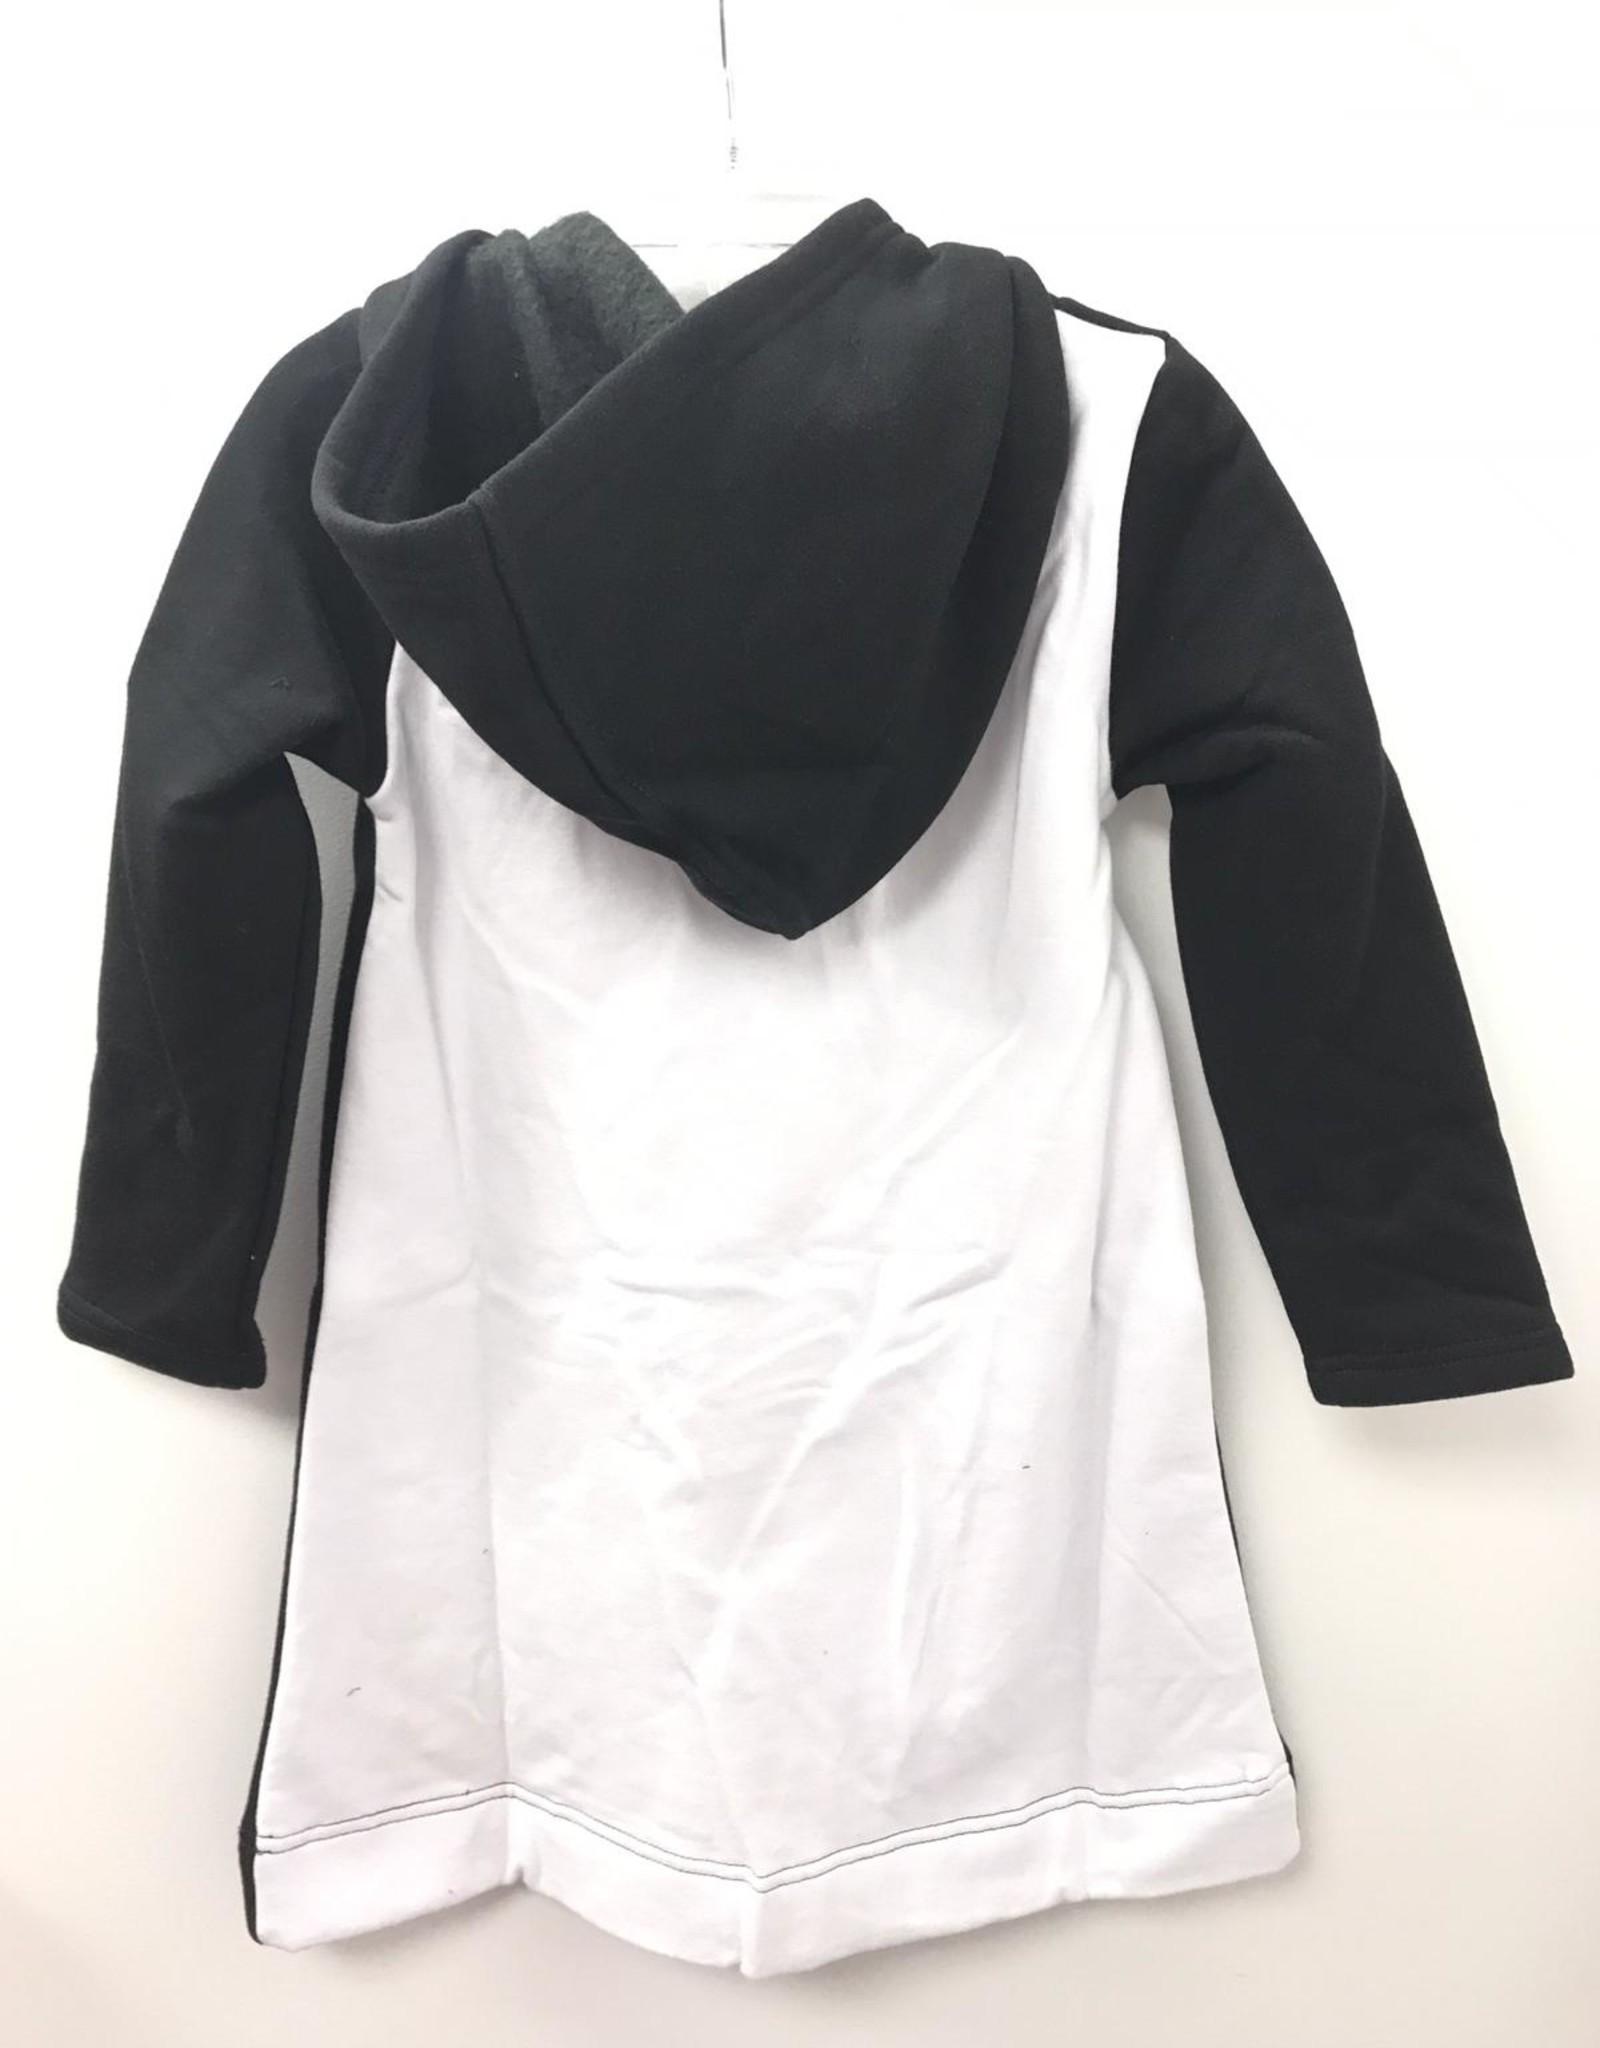 Dot & Line Dot & Line Hooded Sweatshirt Dress with Pockets and Contrast Back